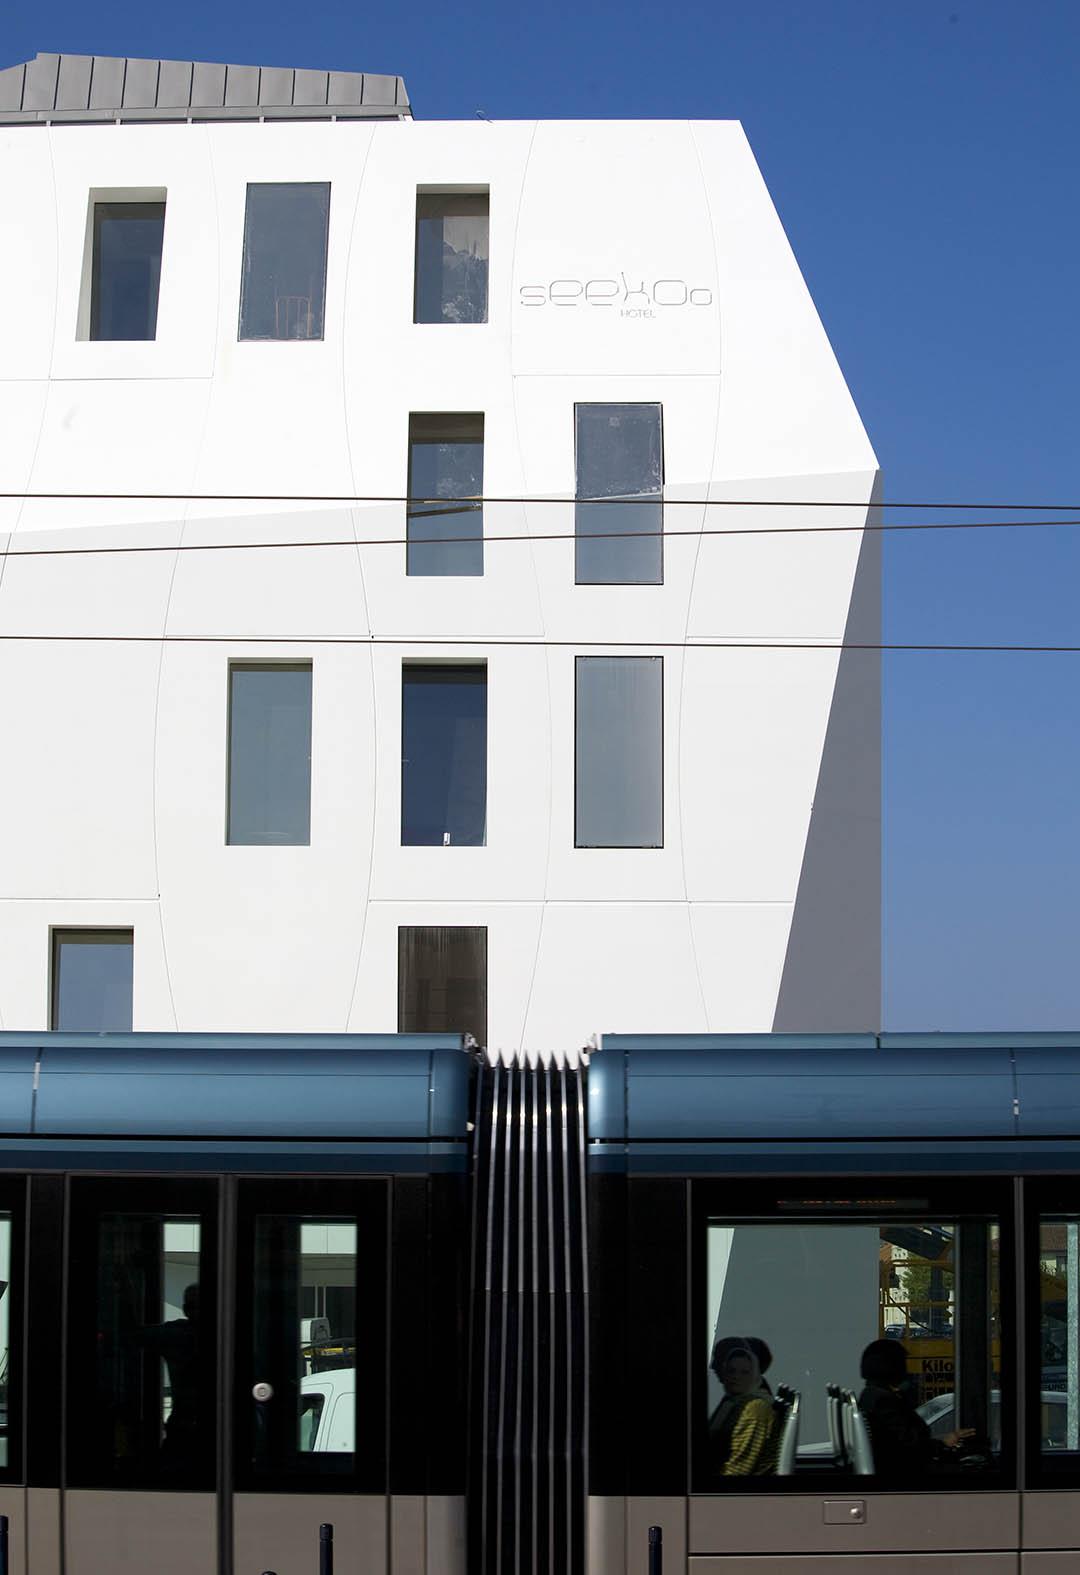 seekoo_tram